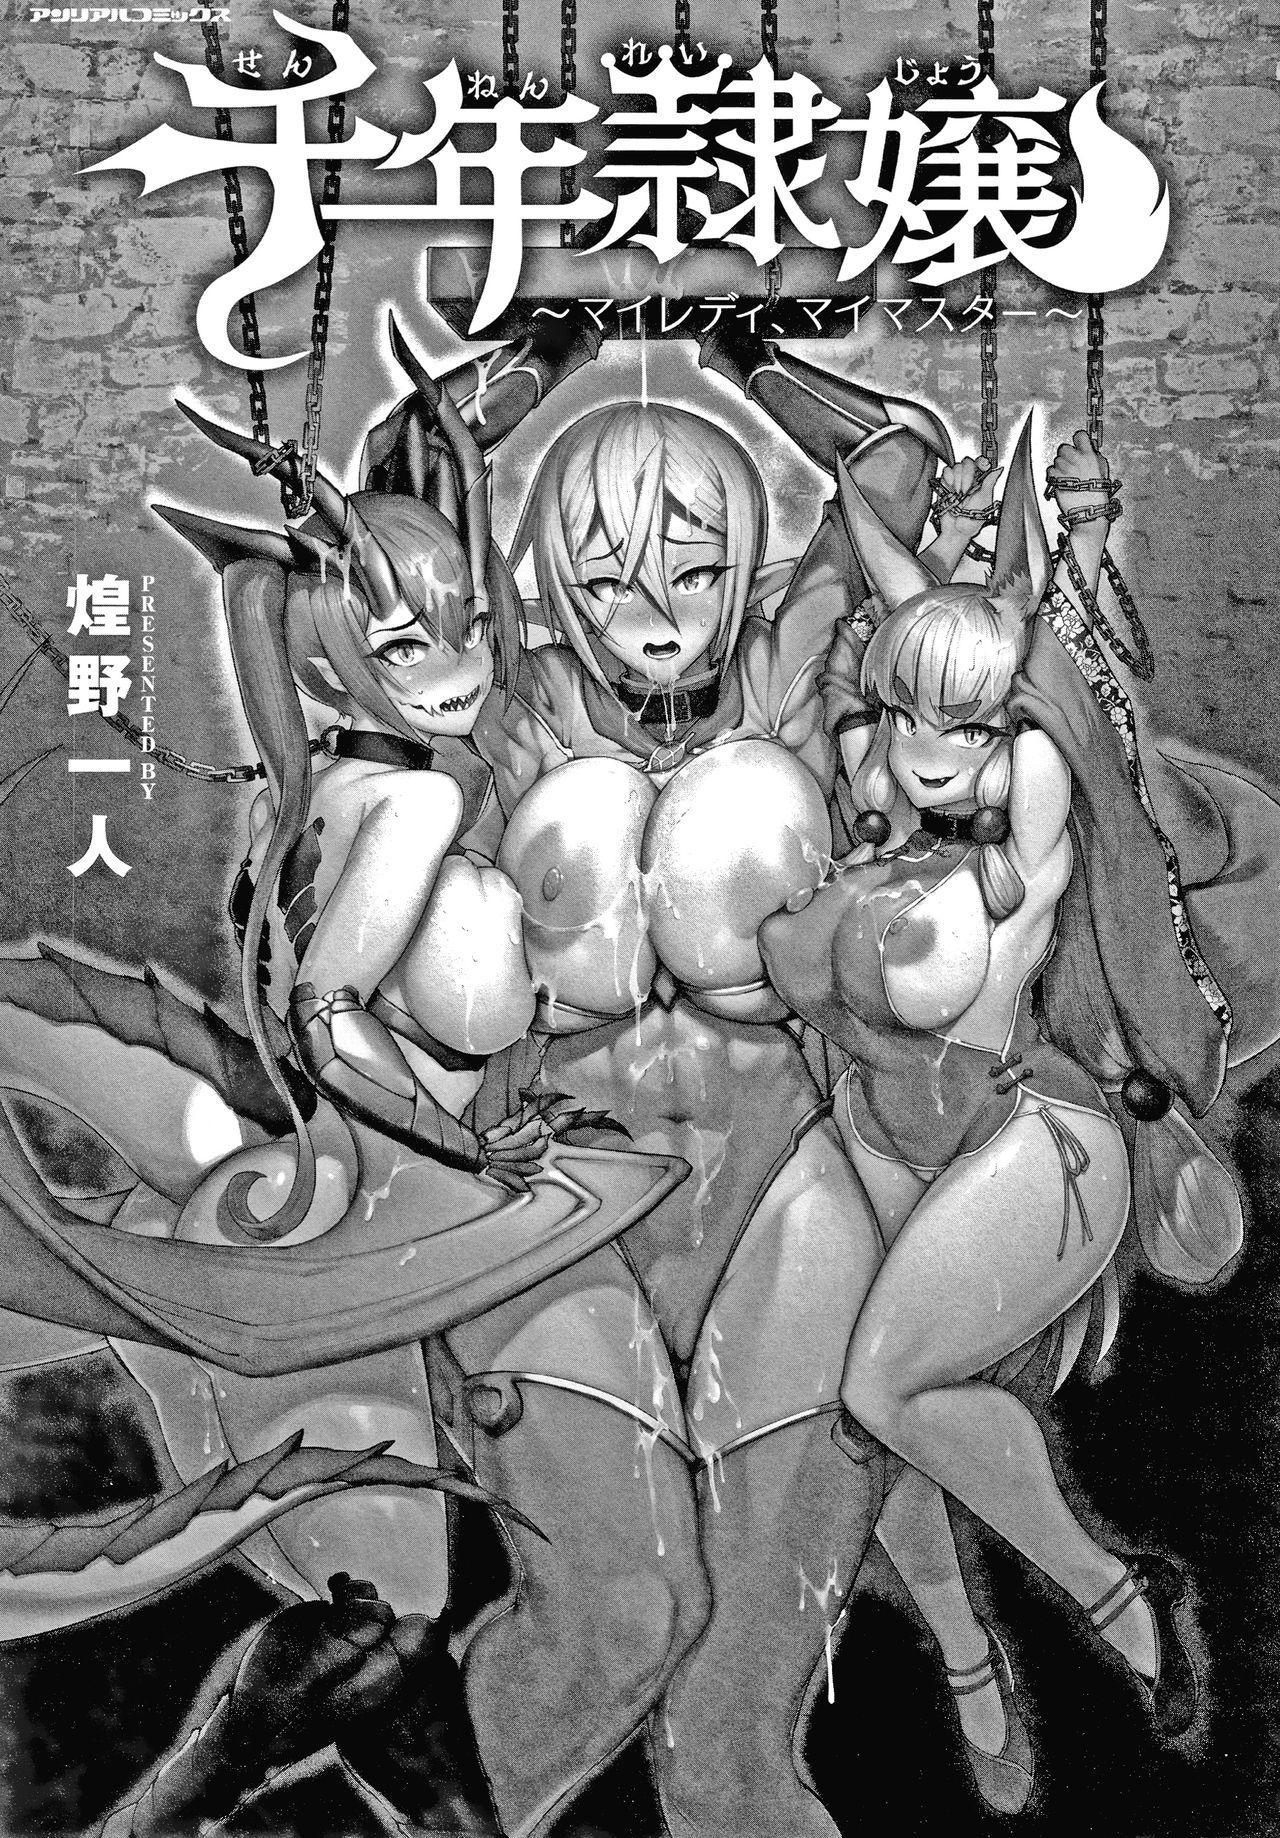 [Fan no Hitori] Sennen Reijou ~My Lady, My Master~  Ch.1-6 [English] {Doujins.com} 3